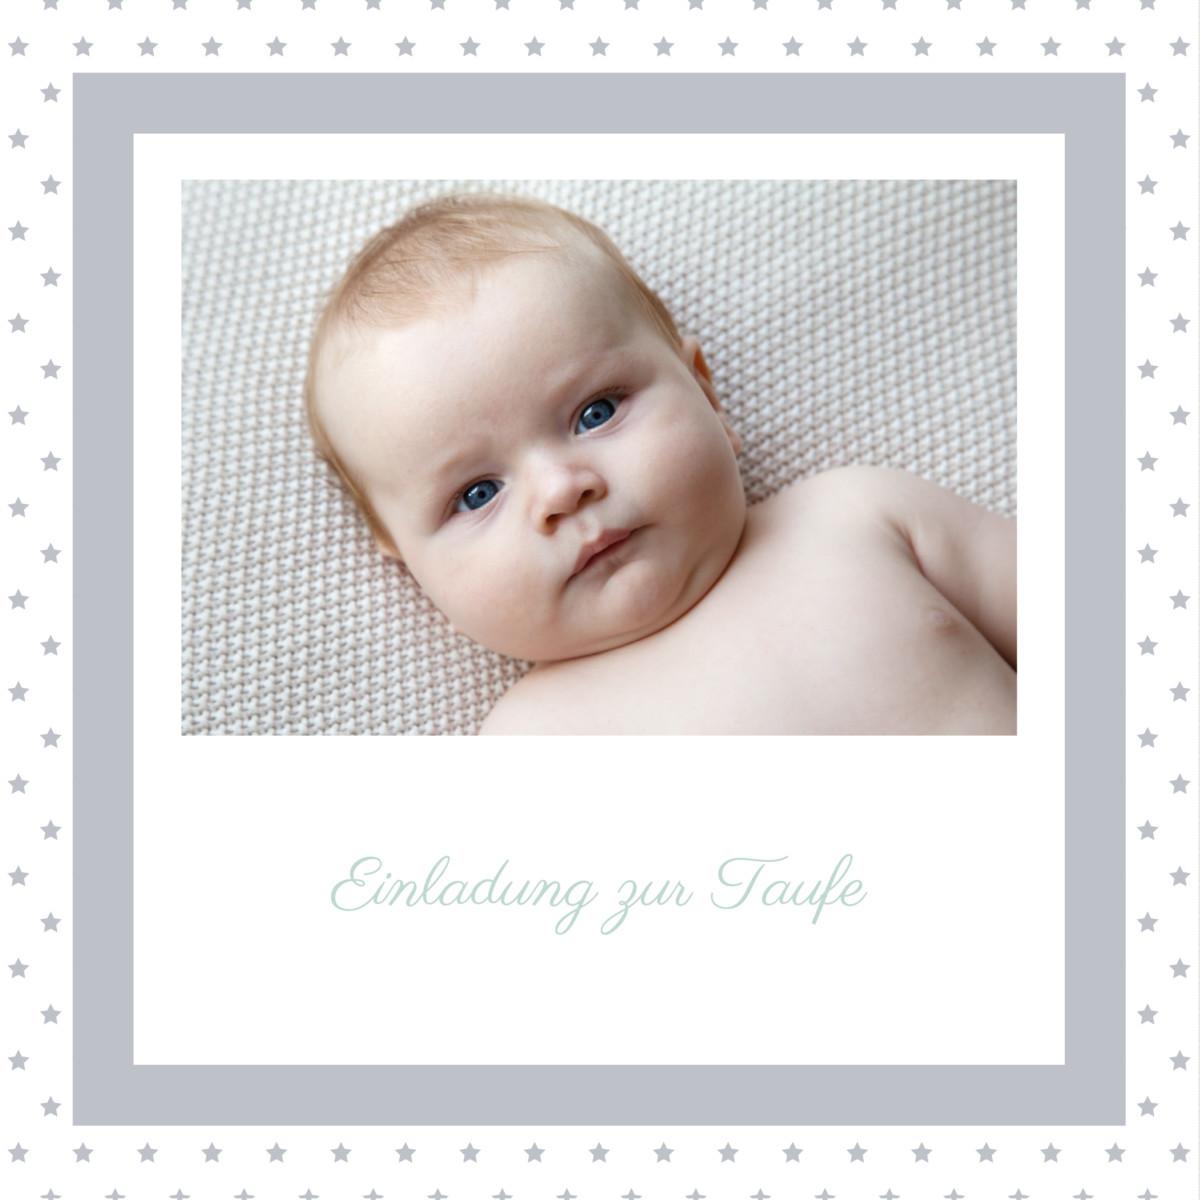 Rosemood: Taufeinladung Tradition Sterne